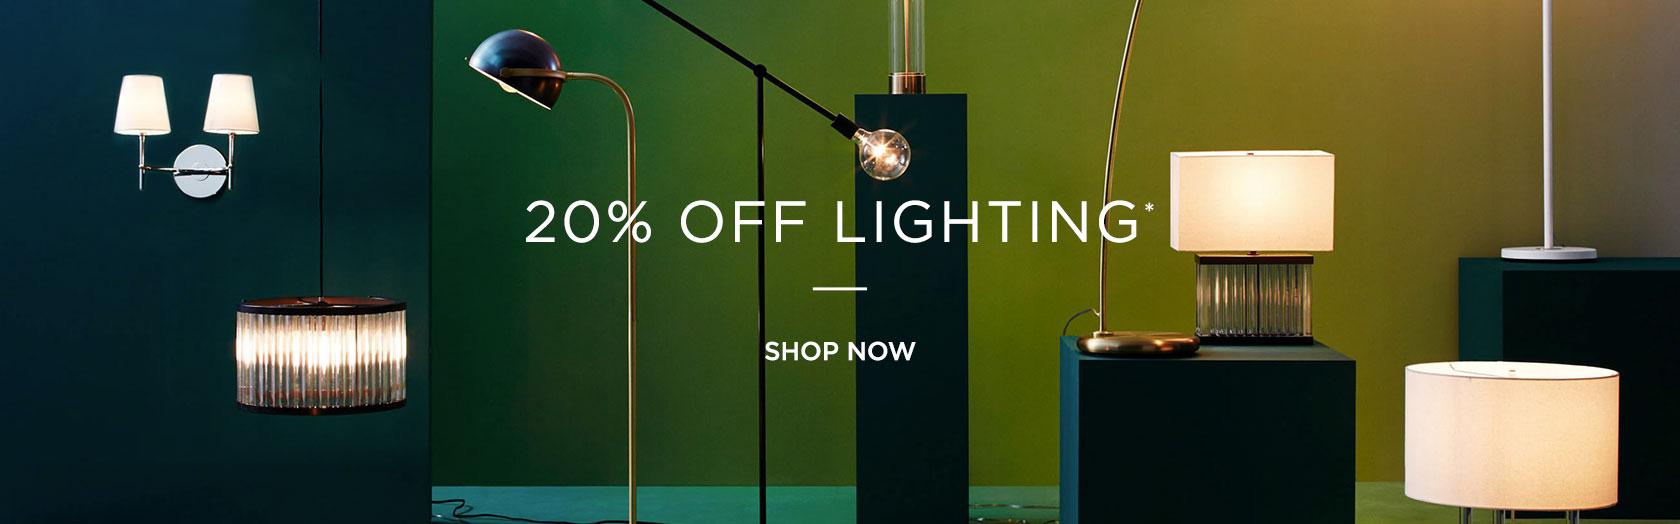 20 Percent Off Lighting